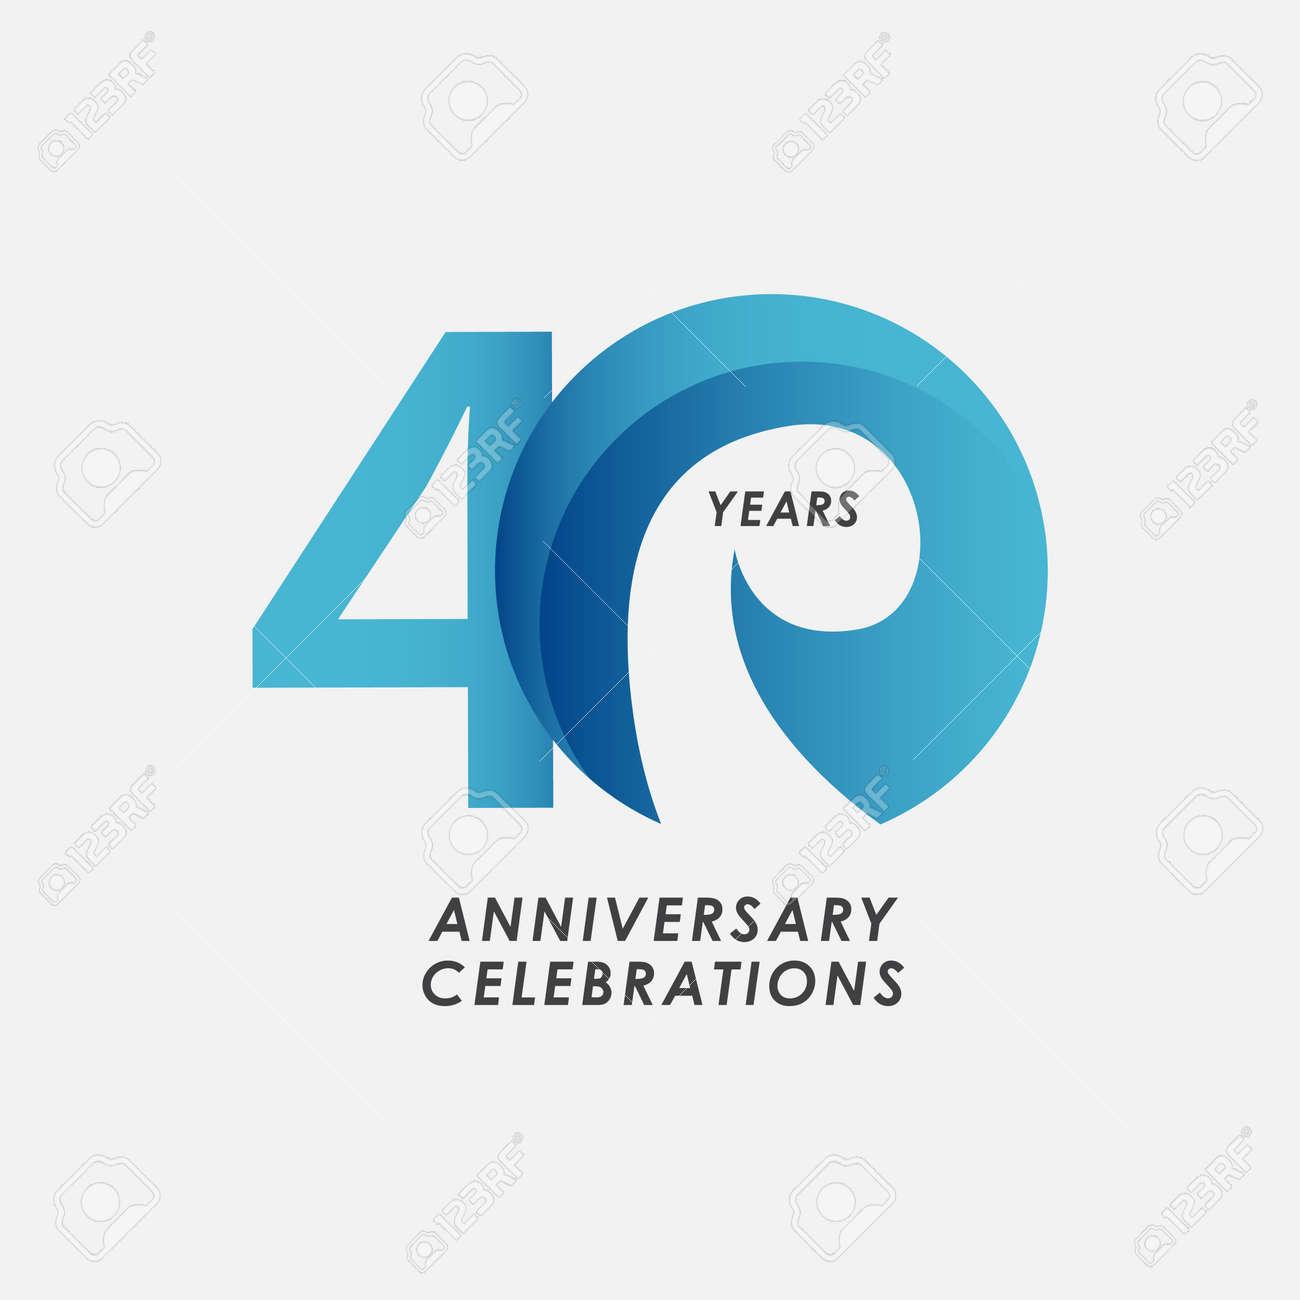 40 Years Anniversary Celebrations Vector Template Design Illustration - 163697983